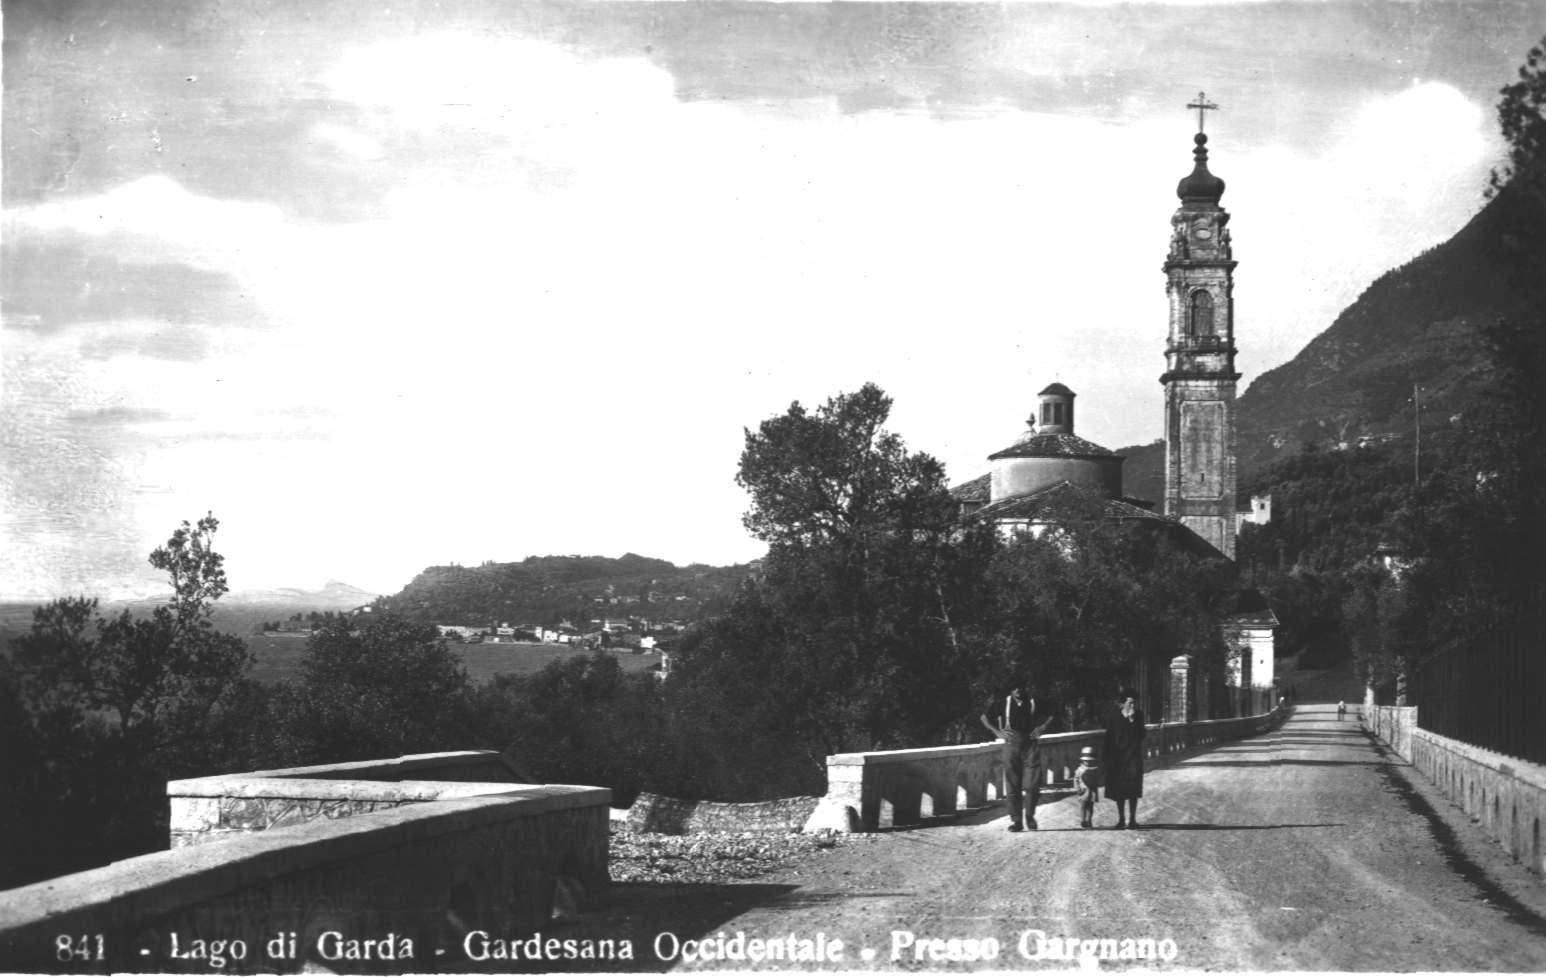 1931 - Inauguration of the Western Gardesana